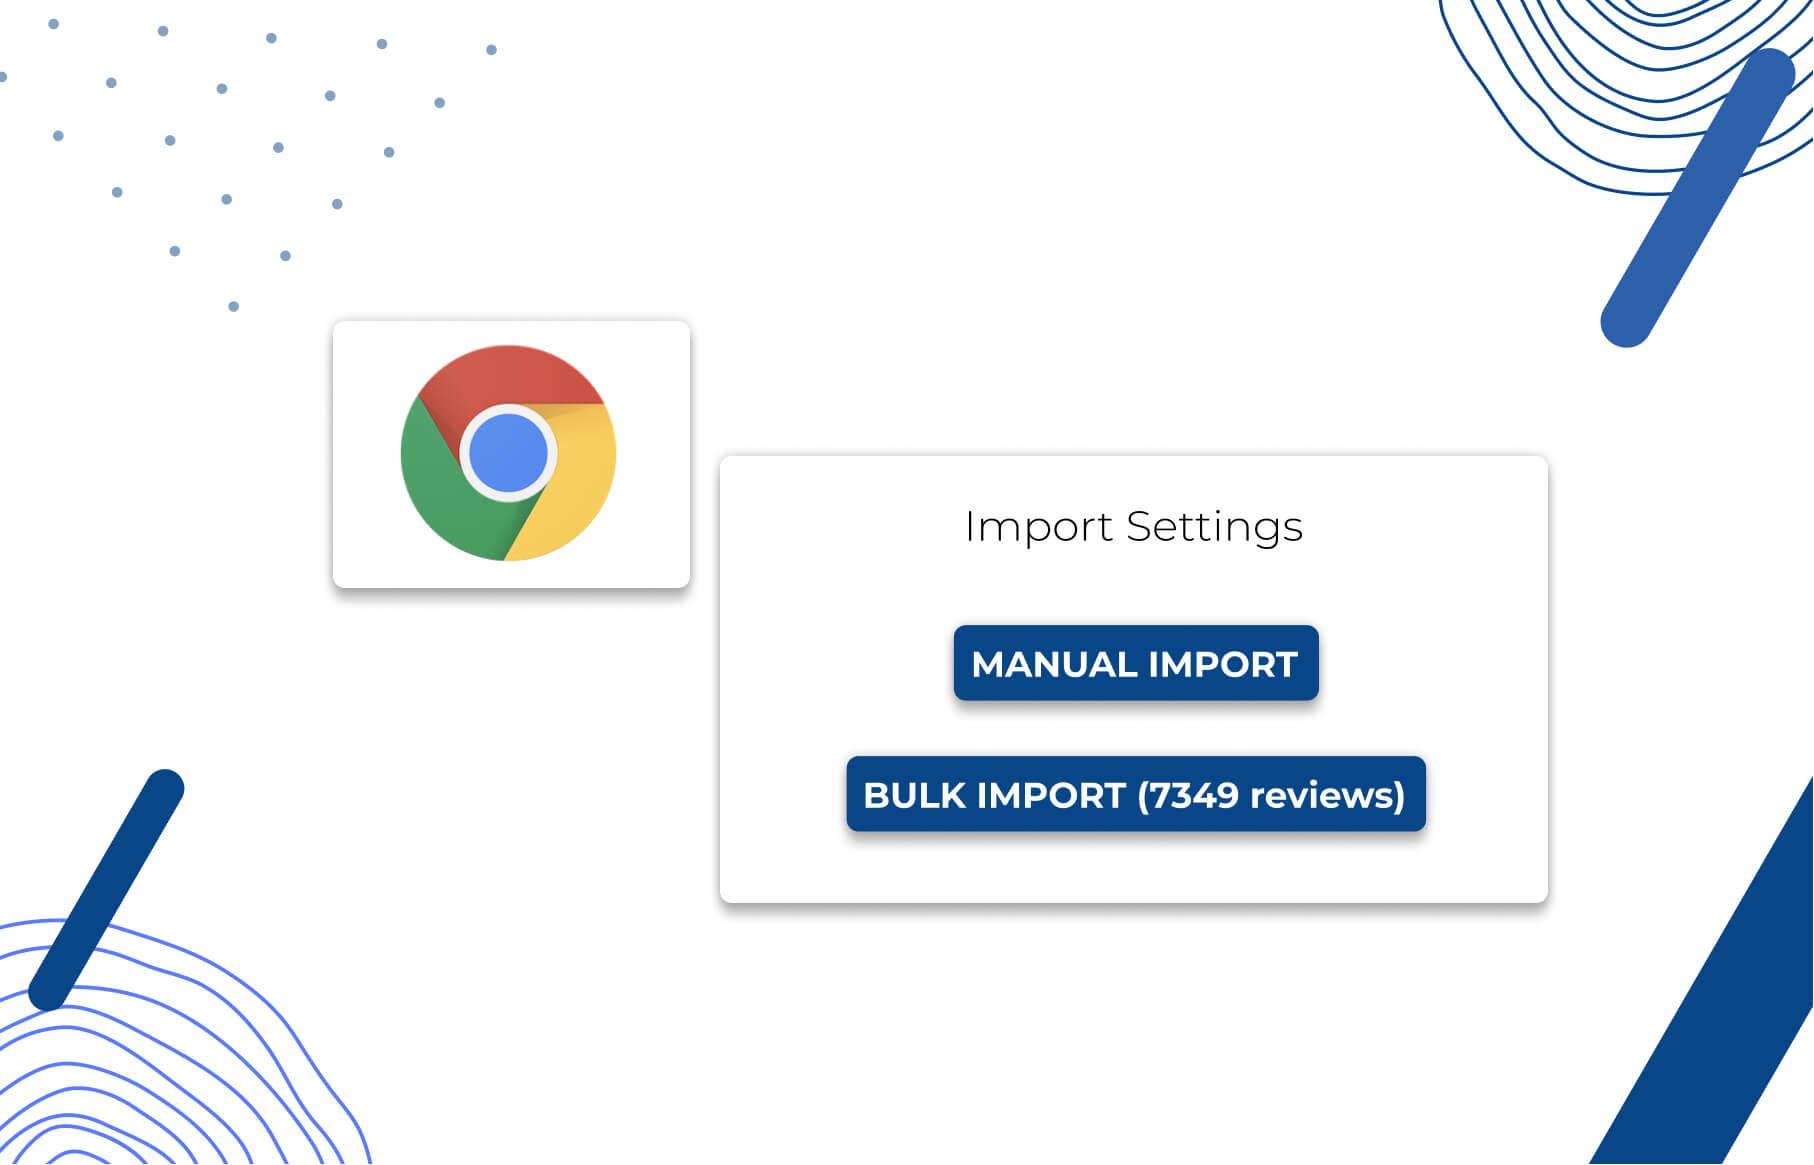 Opinew Google Chrome Extension import settings: Manual Import & Bulk Import